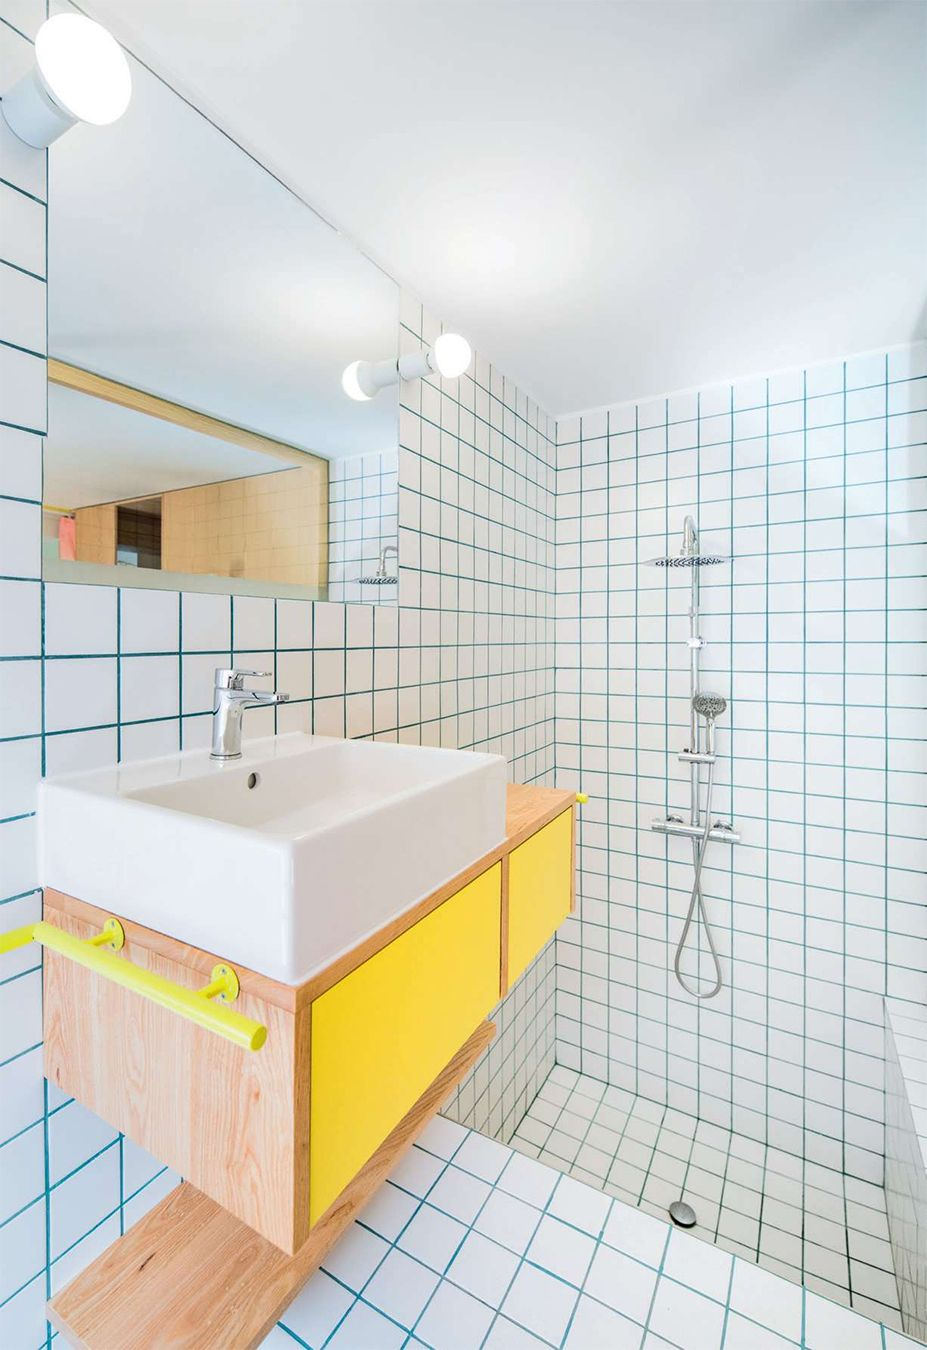 Epingle Par Wom Design Sur Bathrooms Sdb Idee Salle De Bain Styles De Salles De Bain Deco Salle De Bain